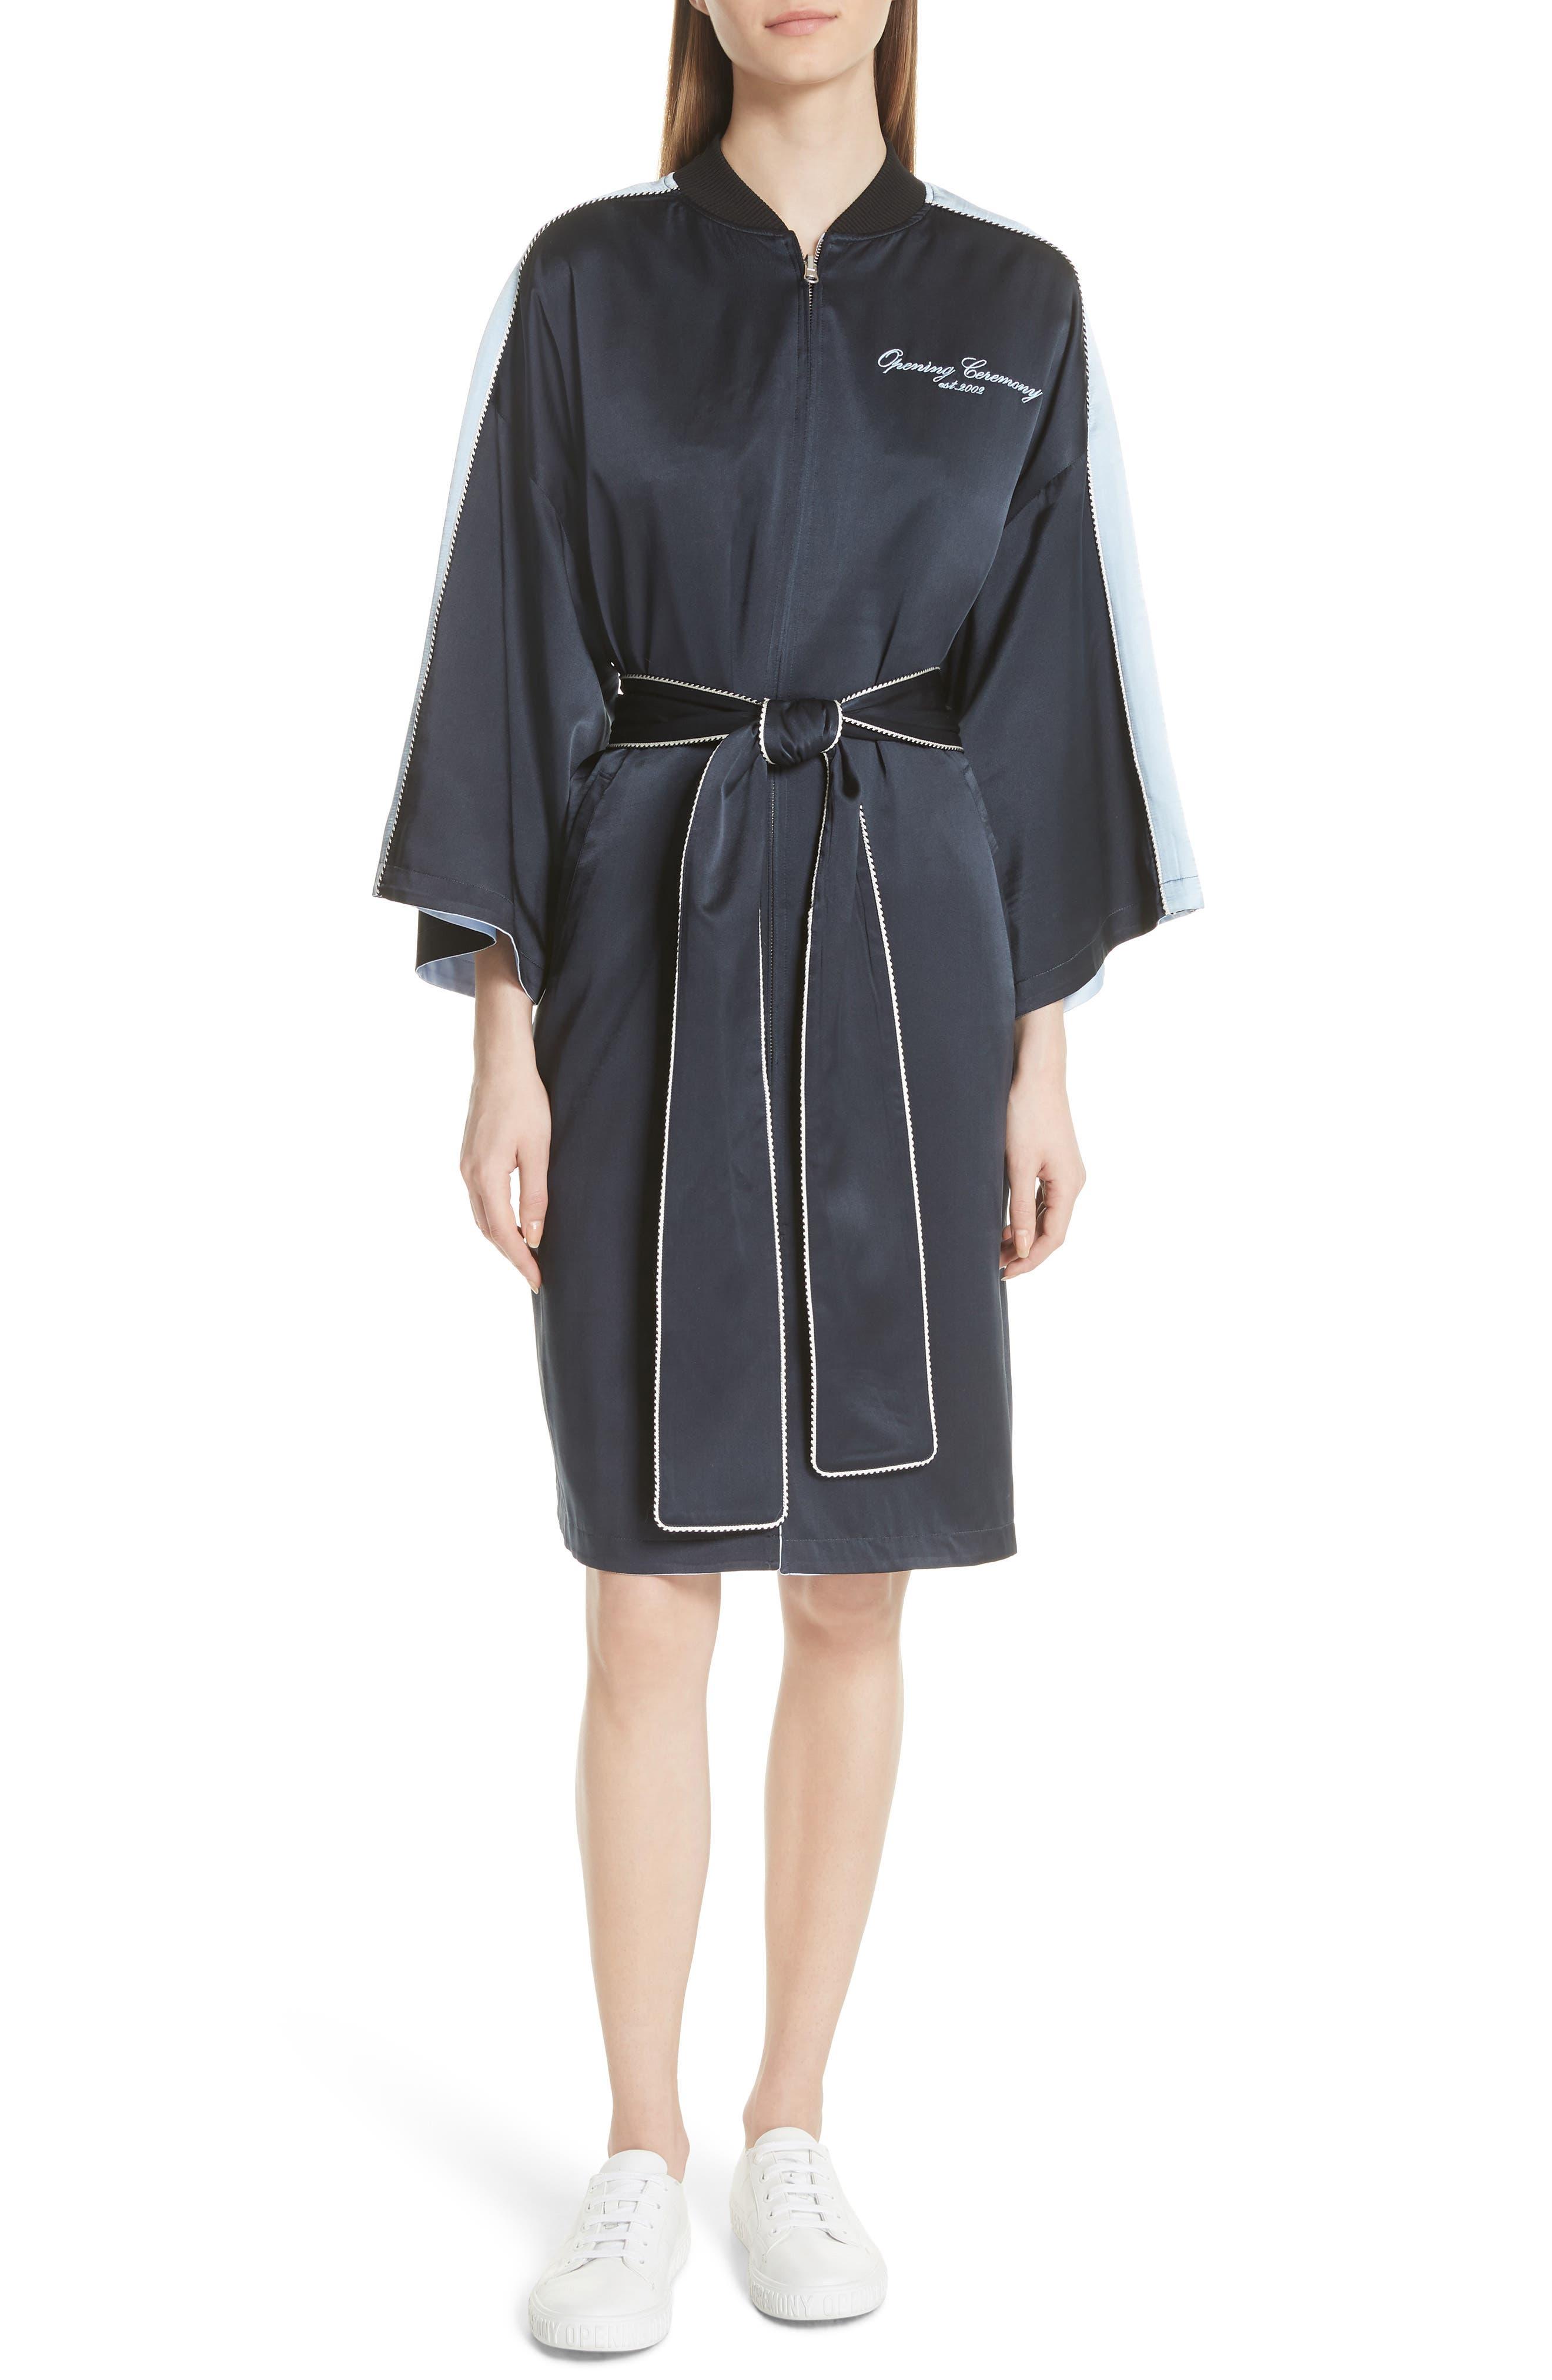 OPENING CEREMONY Reversible Silk Kimono Robe, Main, color, 435